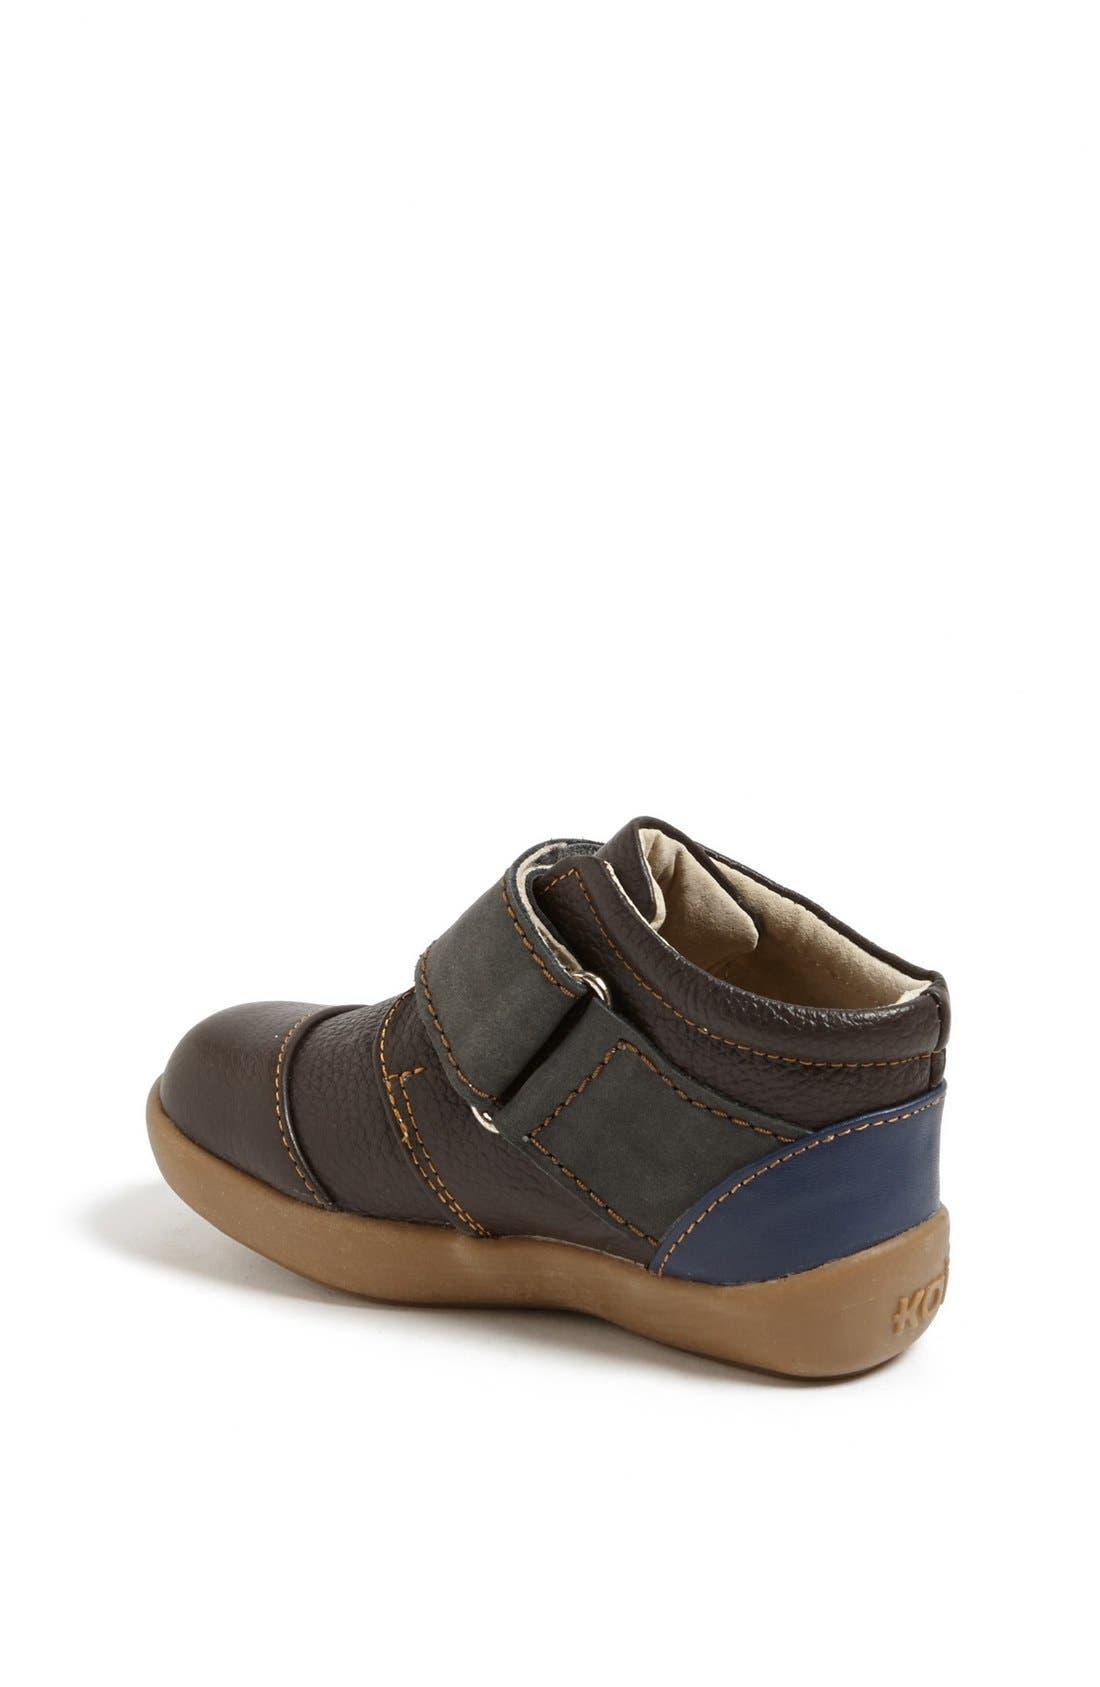 Alternate Image 2  - See Kai Run 'Alden' Boot (Toddler & Little Kid)